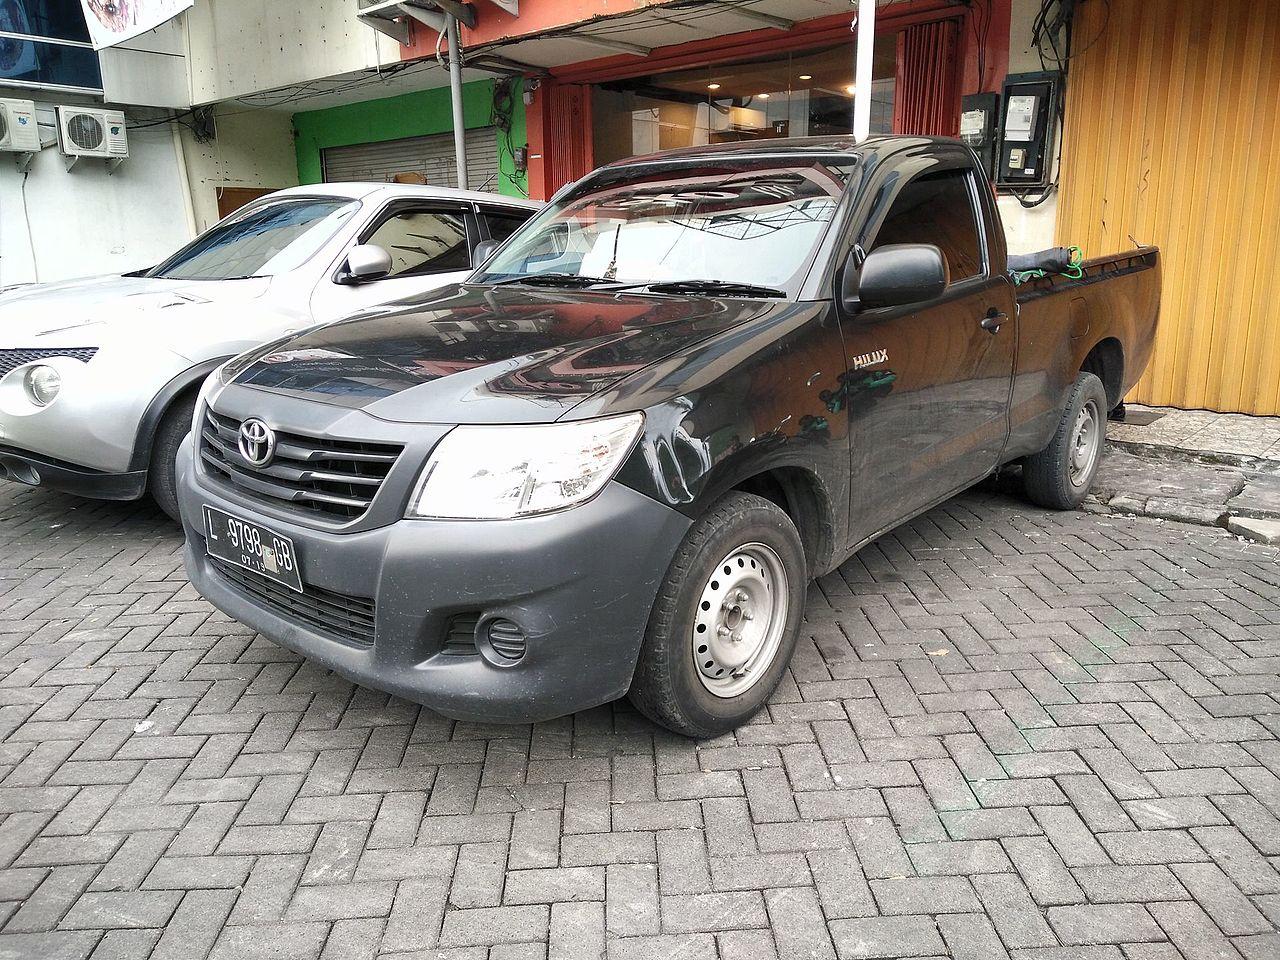 File:25 Toyota Hilux Single Cabin, West Surabaya.jpg - Wikimedia